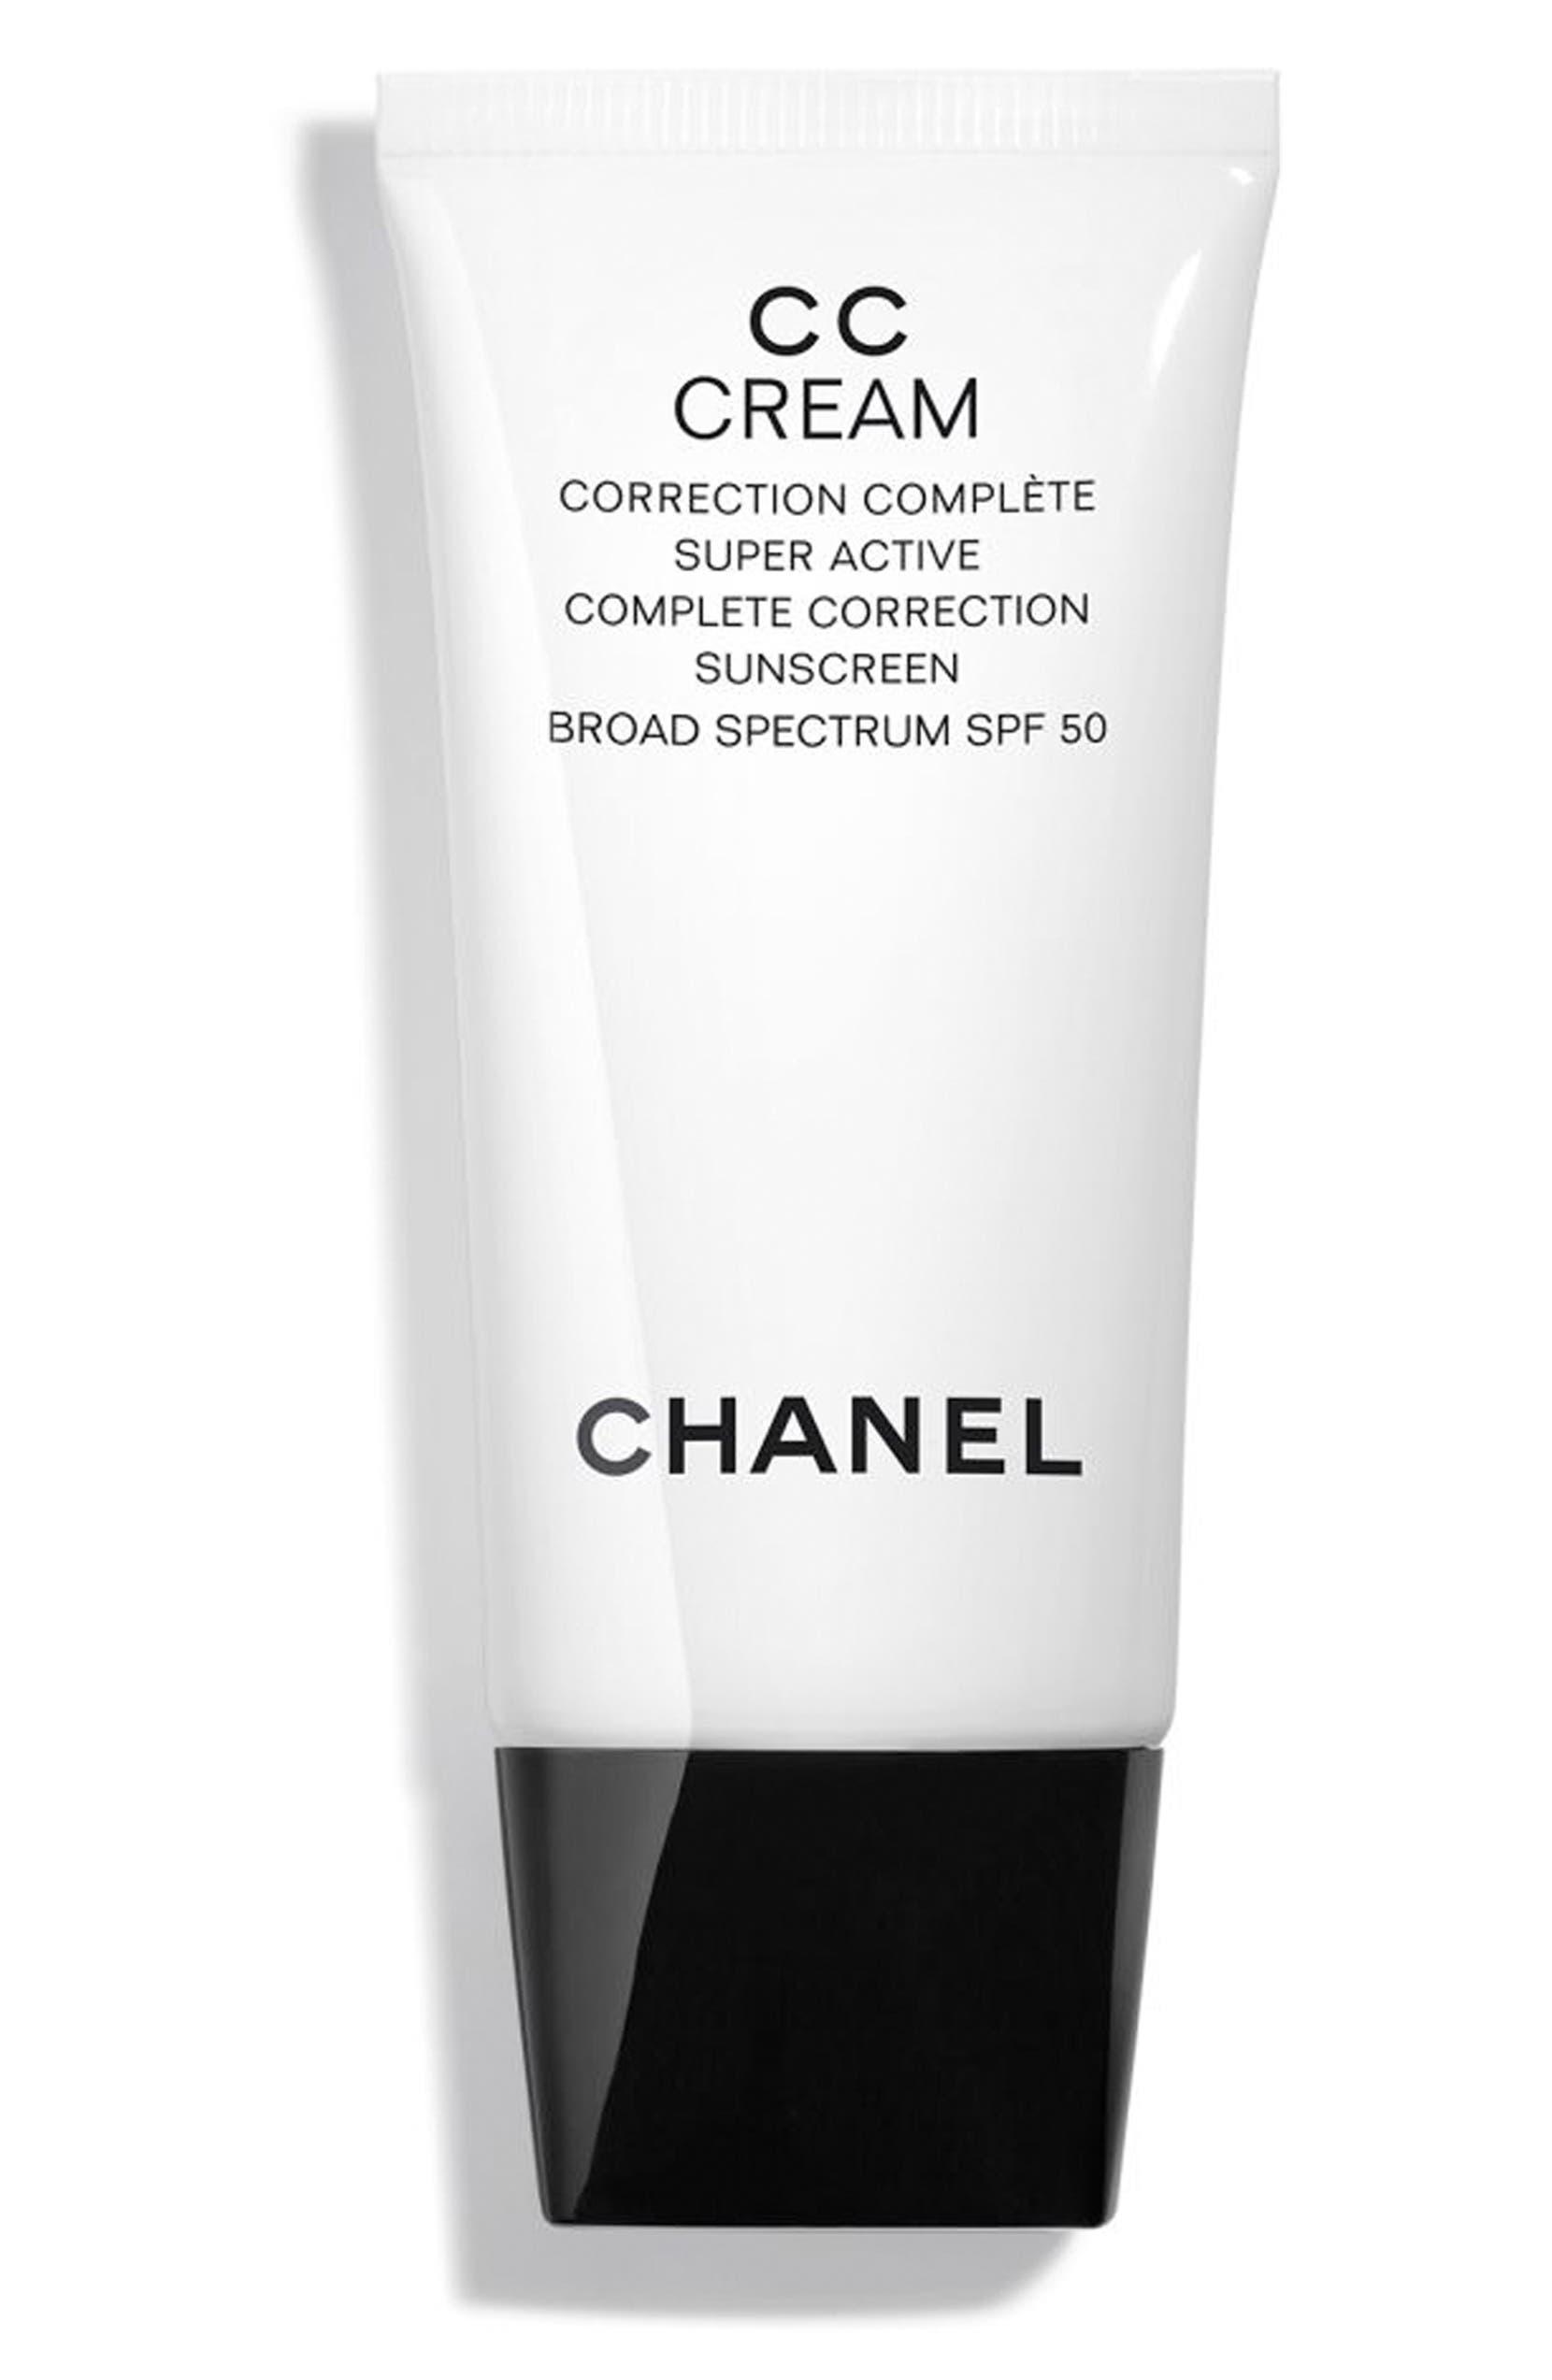 CC CREAM Super Active Correction Complete Sunscreen SPF 50